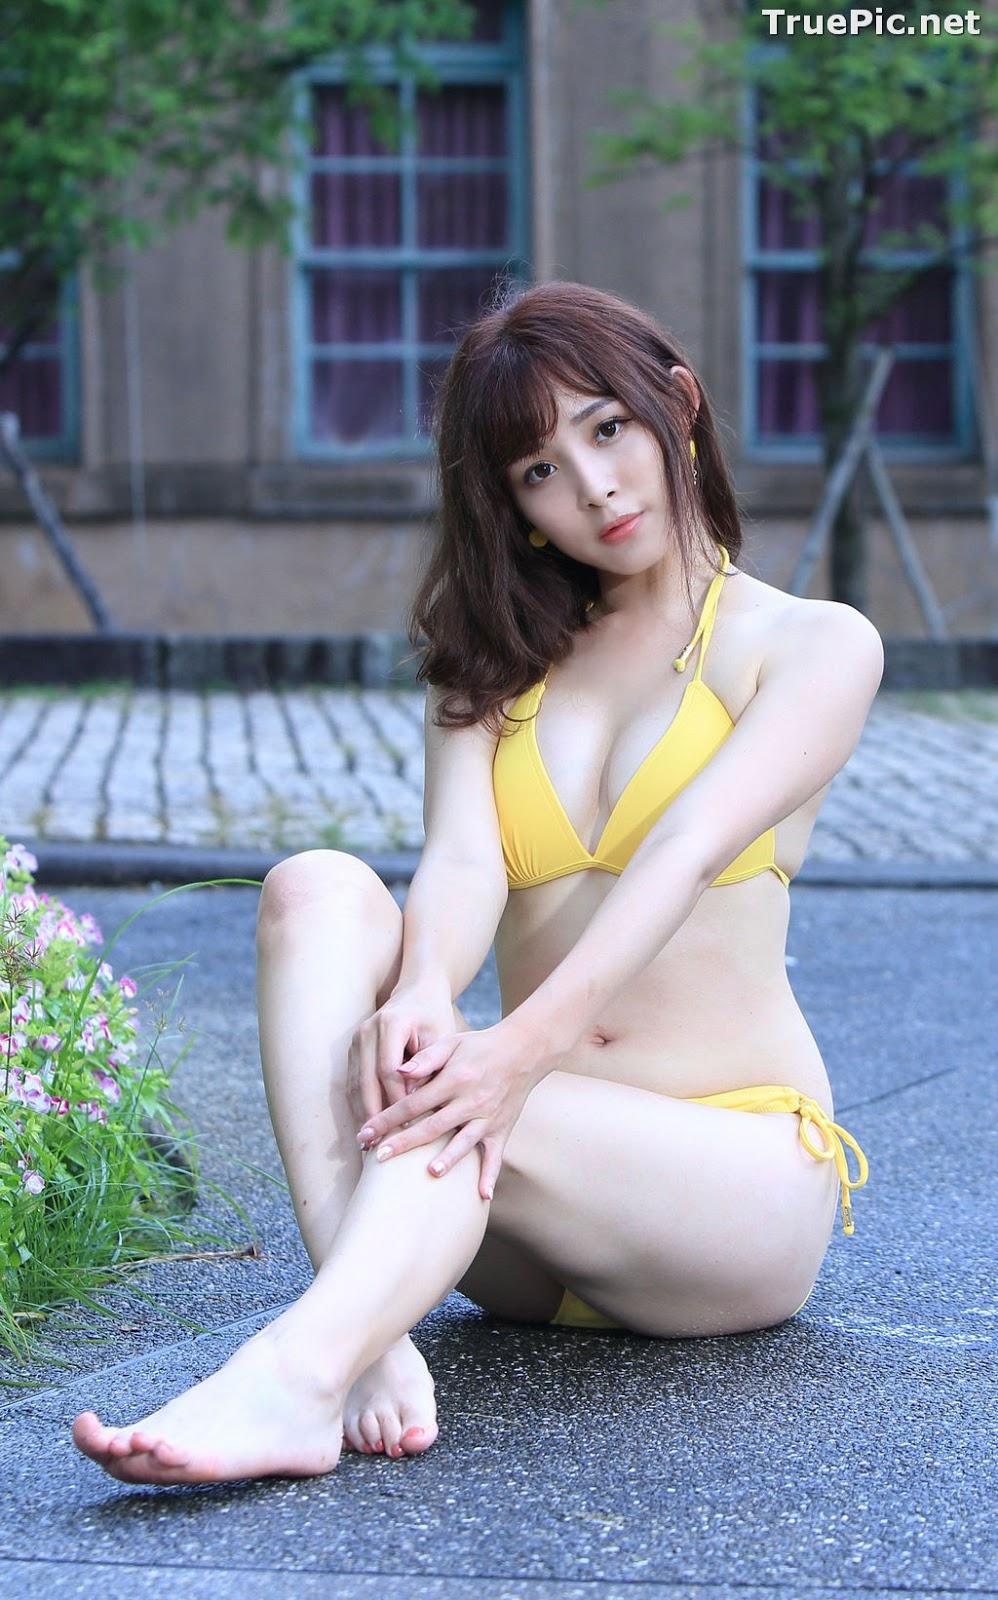 Image Taiwanese Model - Ash Ley - Yellow Bikini at Taipei Water Museum - TruePic.net - Picture-44